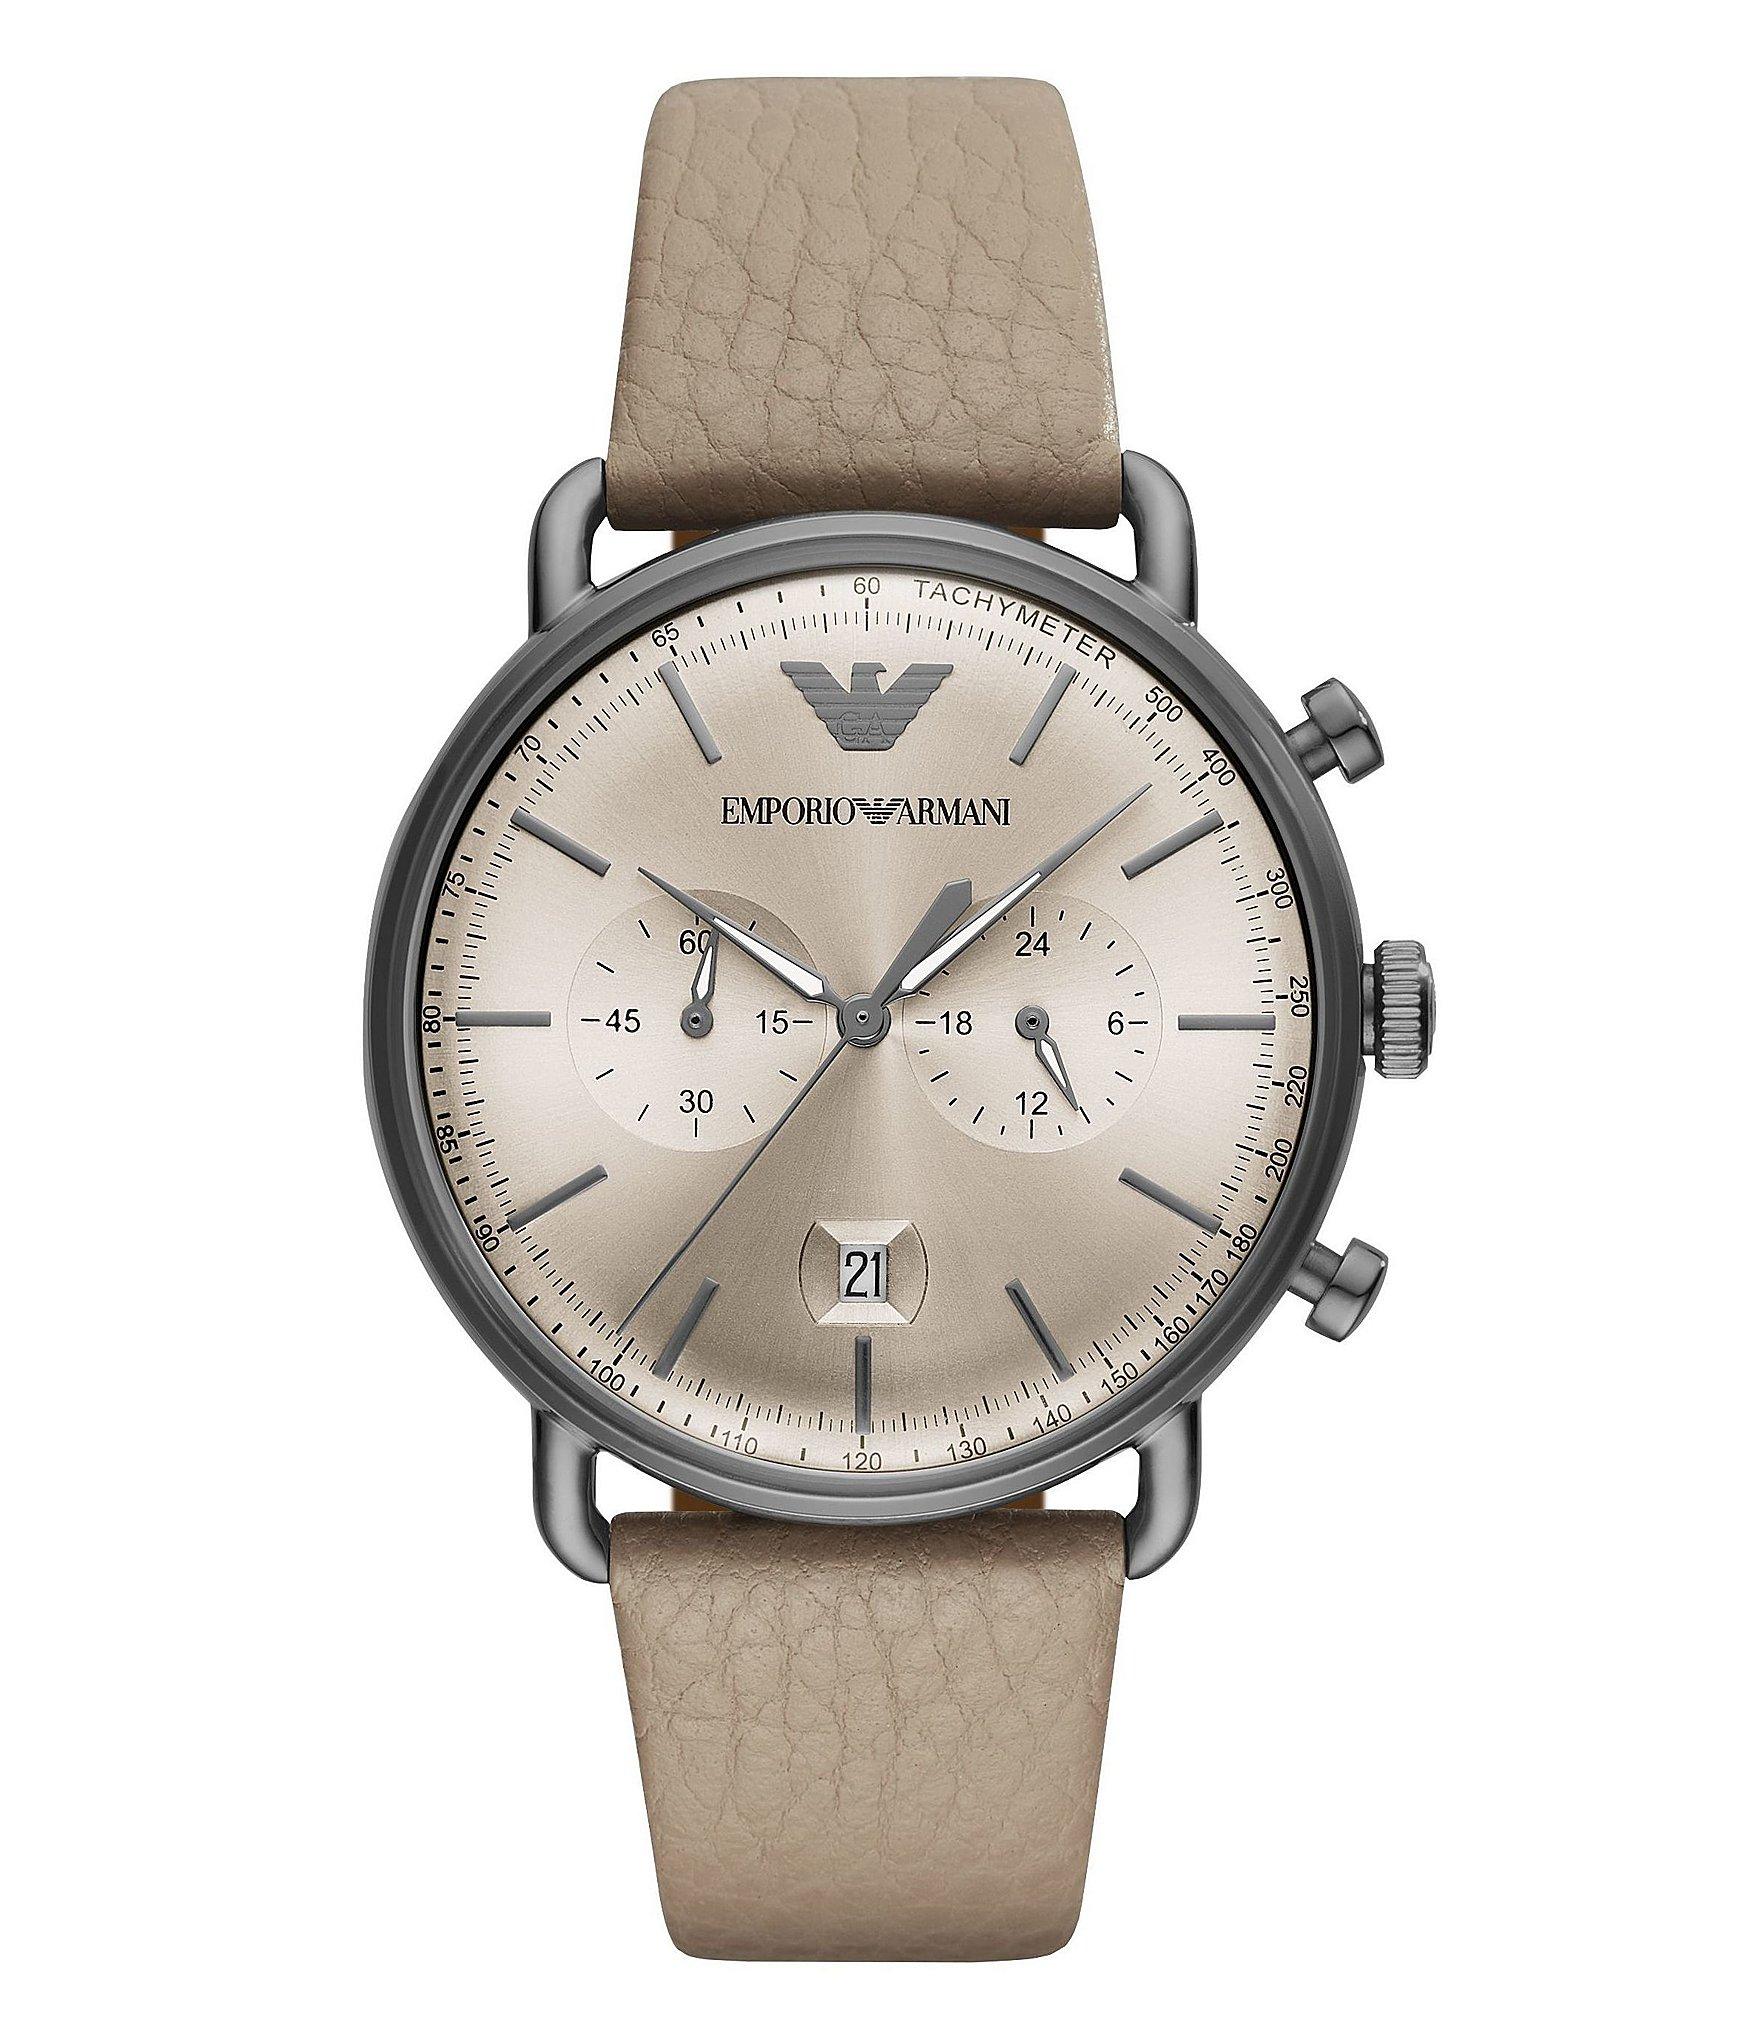 emporio armani taupe leather aviator men 39 s dress watch. Black Bedroom Furniture Sets. Home Design Ideas